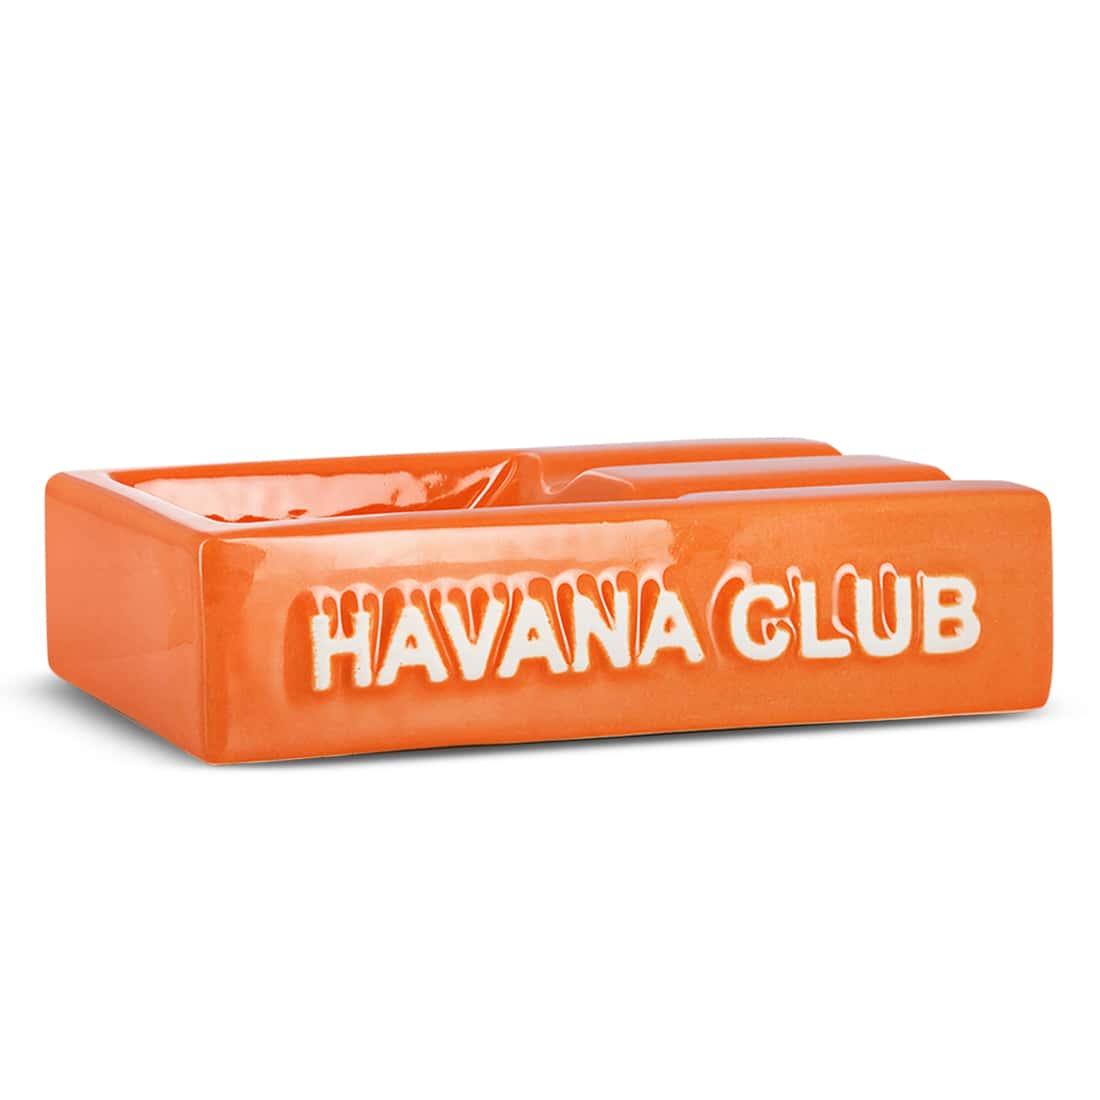 Photo de Cendrier Havana Club Rectangulaire El Segundo Orange